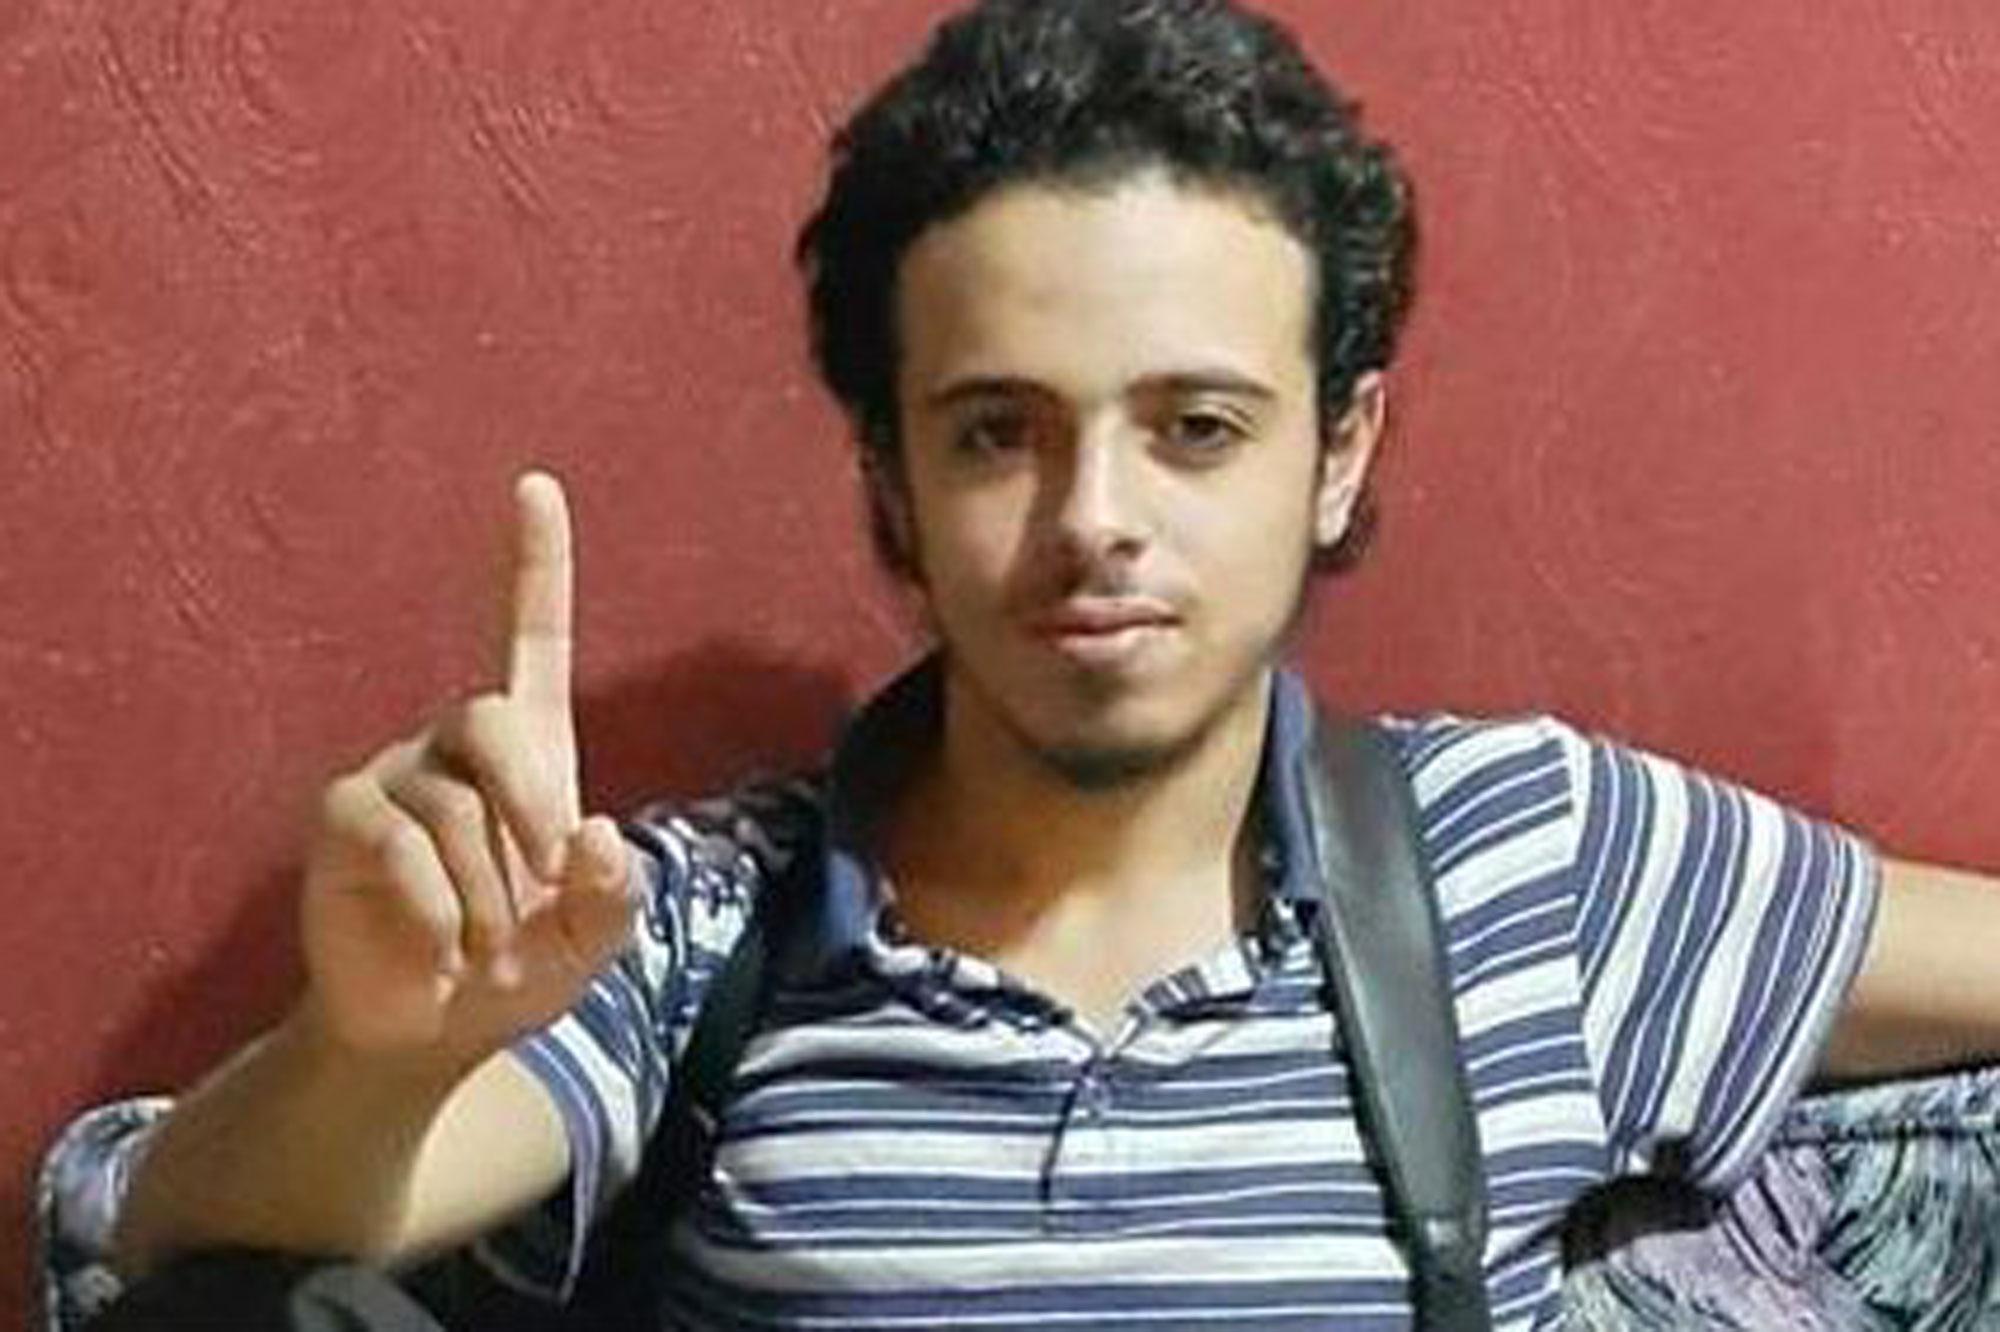 Bilal-Hadfi-kamikaze-de-20-ans